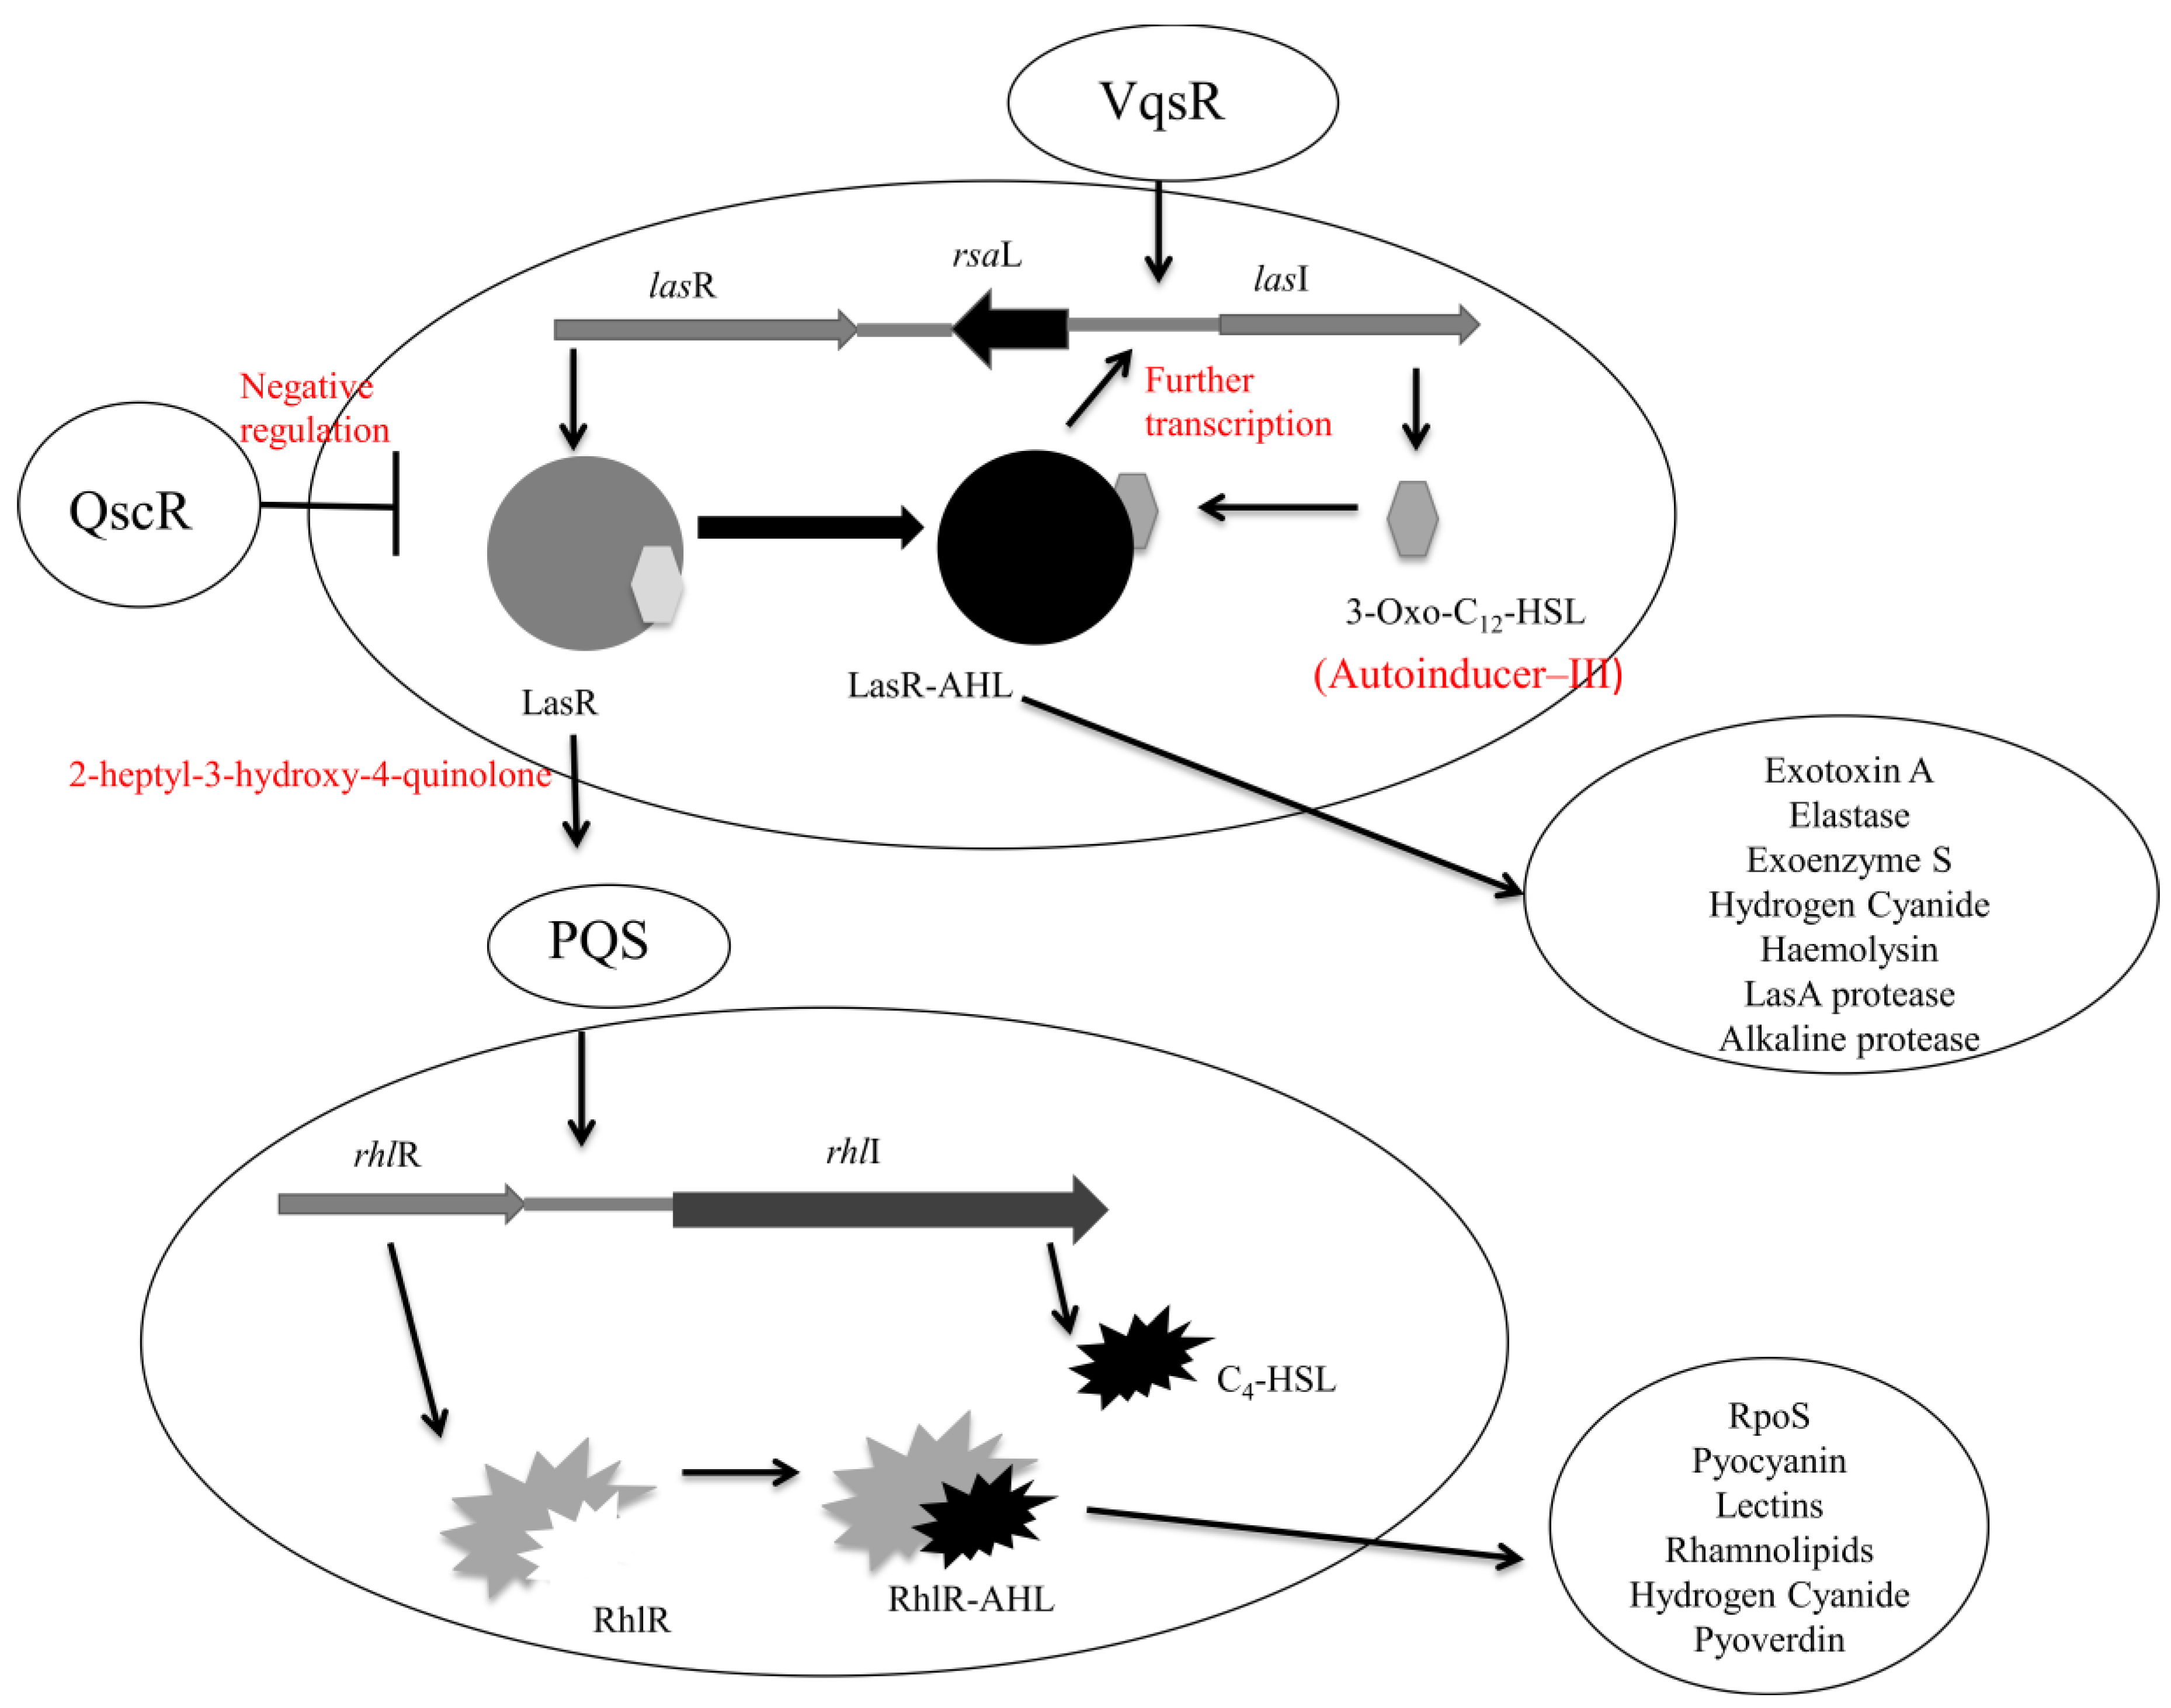 The formation of pseudomonas biofilms biology essay